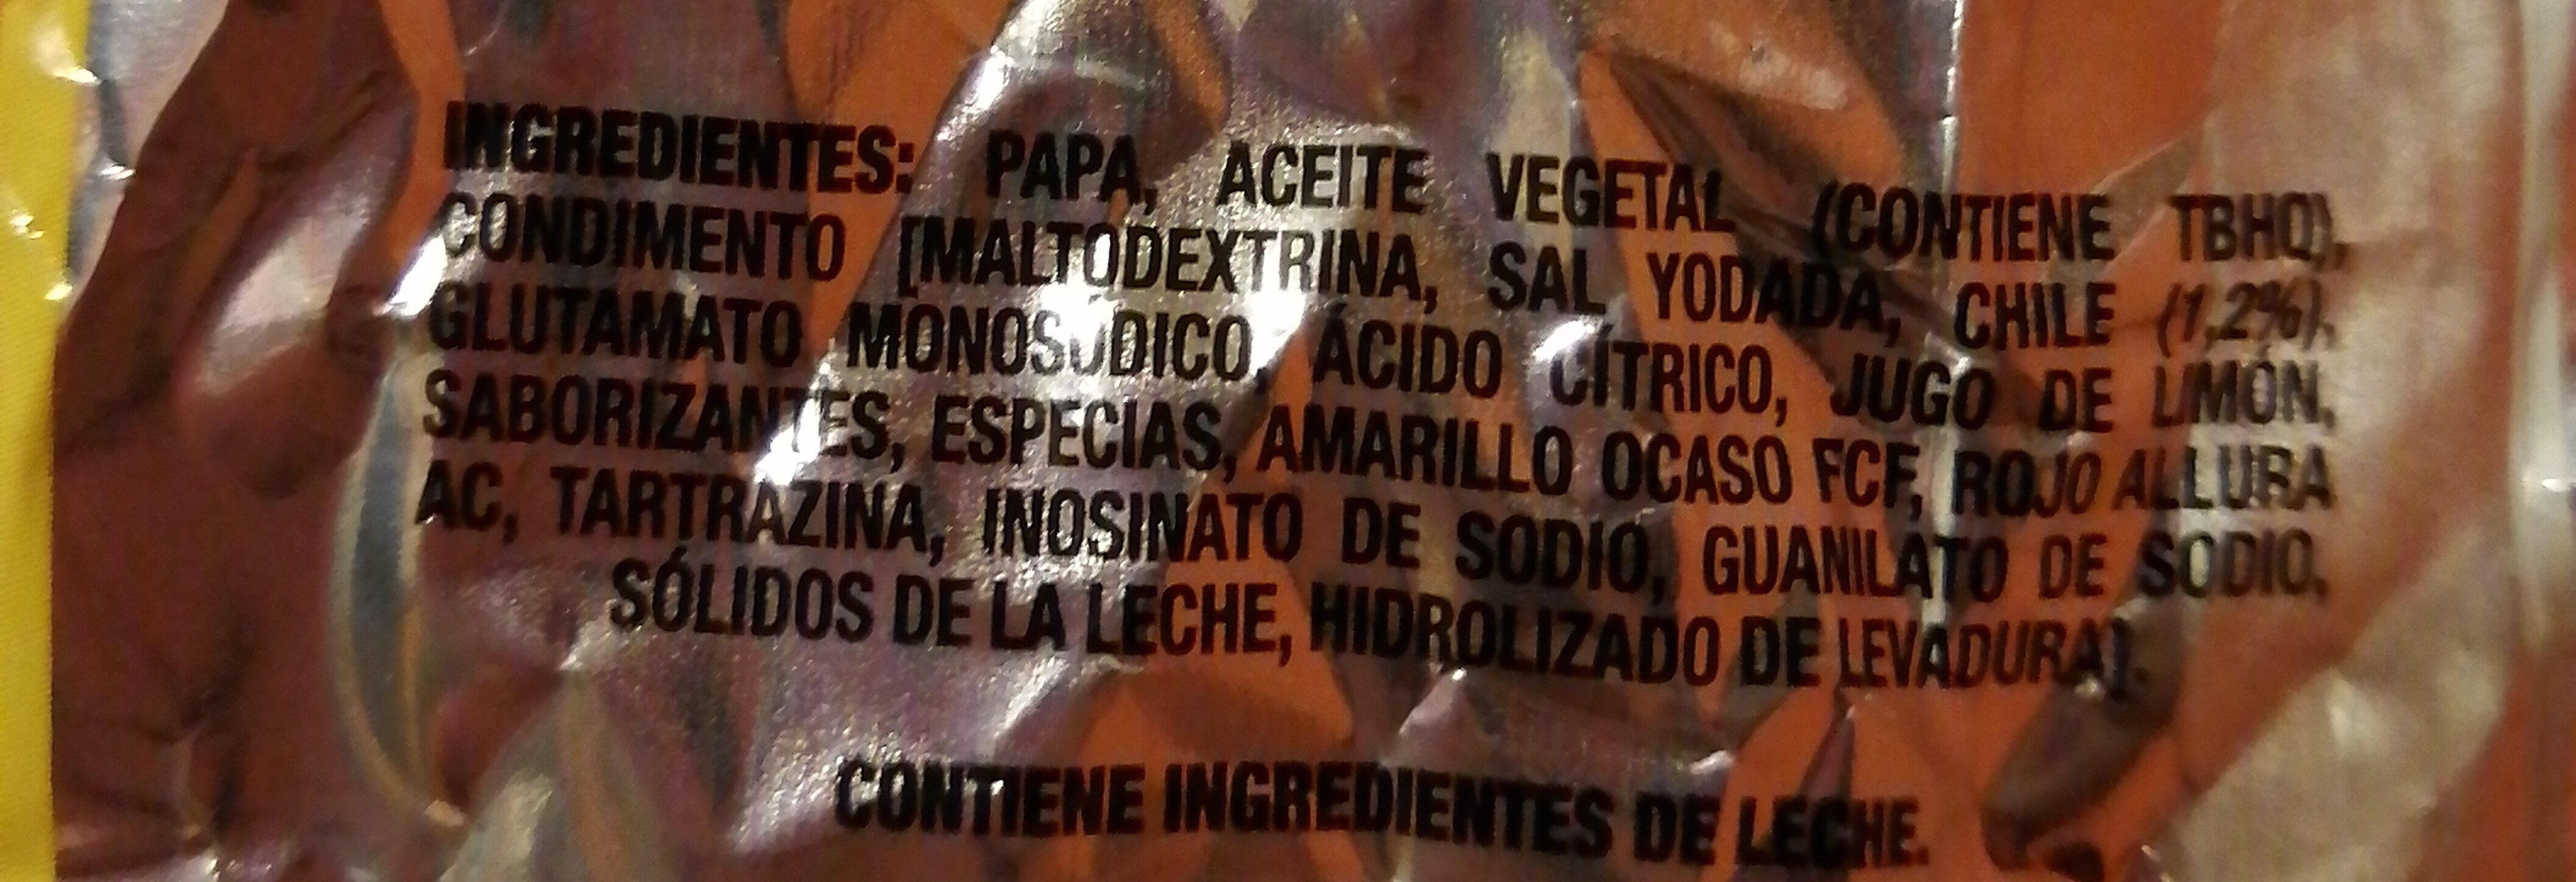 Mega crunch salsa roja - Ingredientes - es